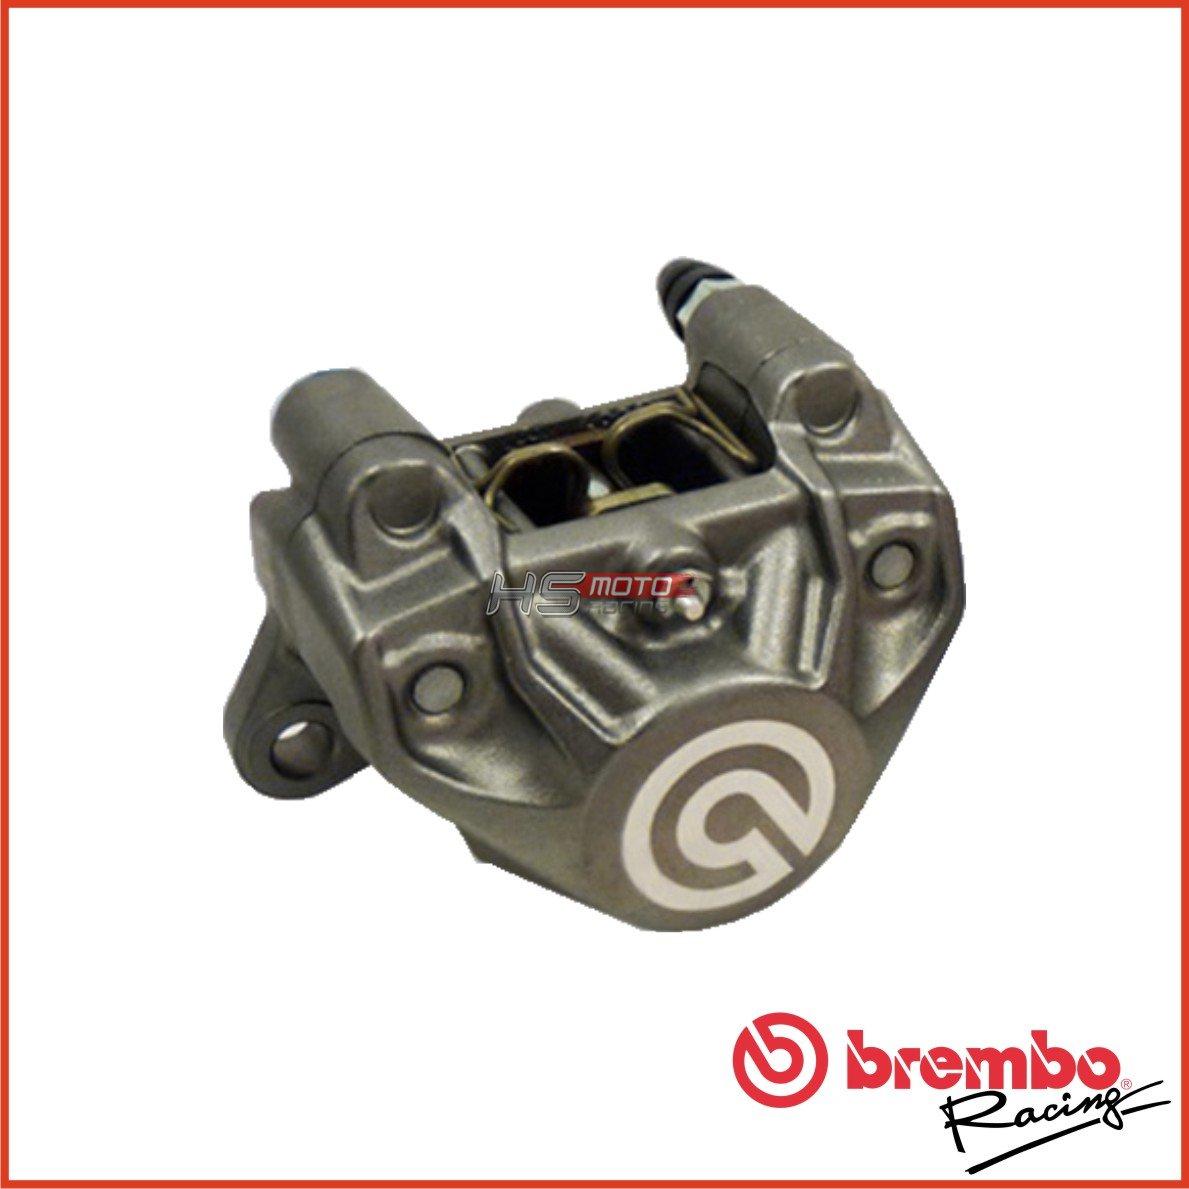 Brembo Brake Pads >> BREMBO Brake Caliper- Rear Sport Casted – 2 pieces P2 34